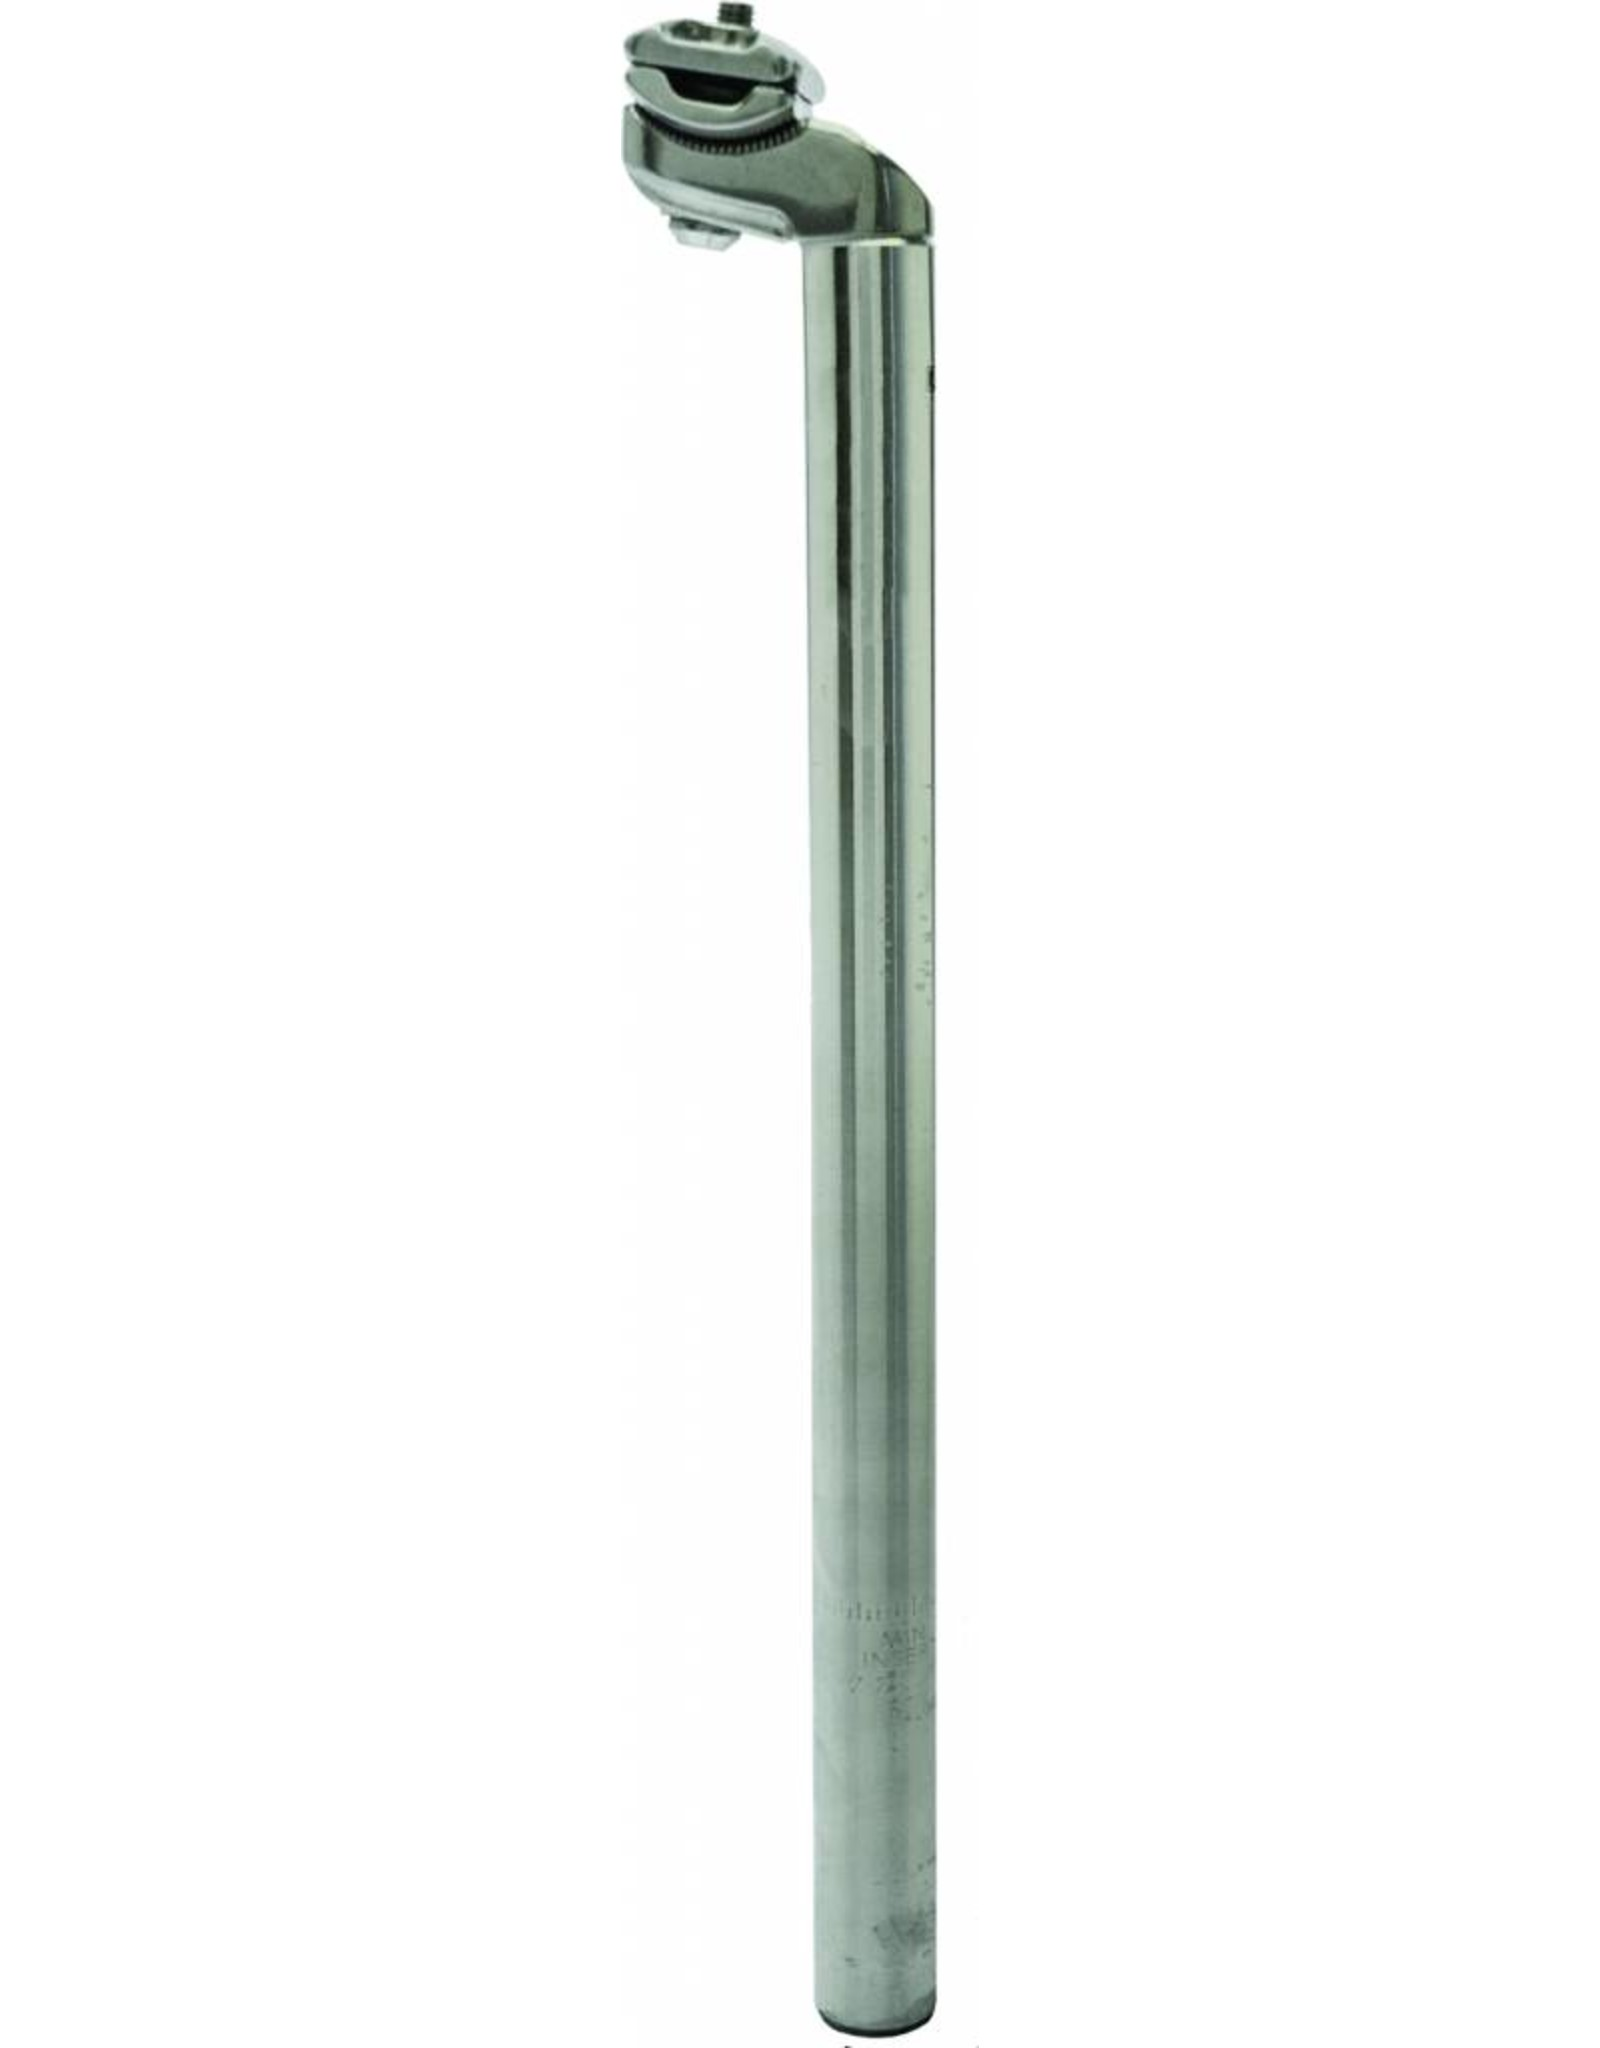 26.8mm Alloy Seatpost